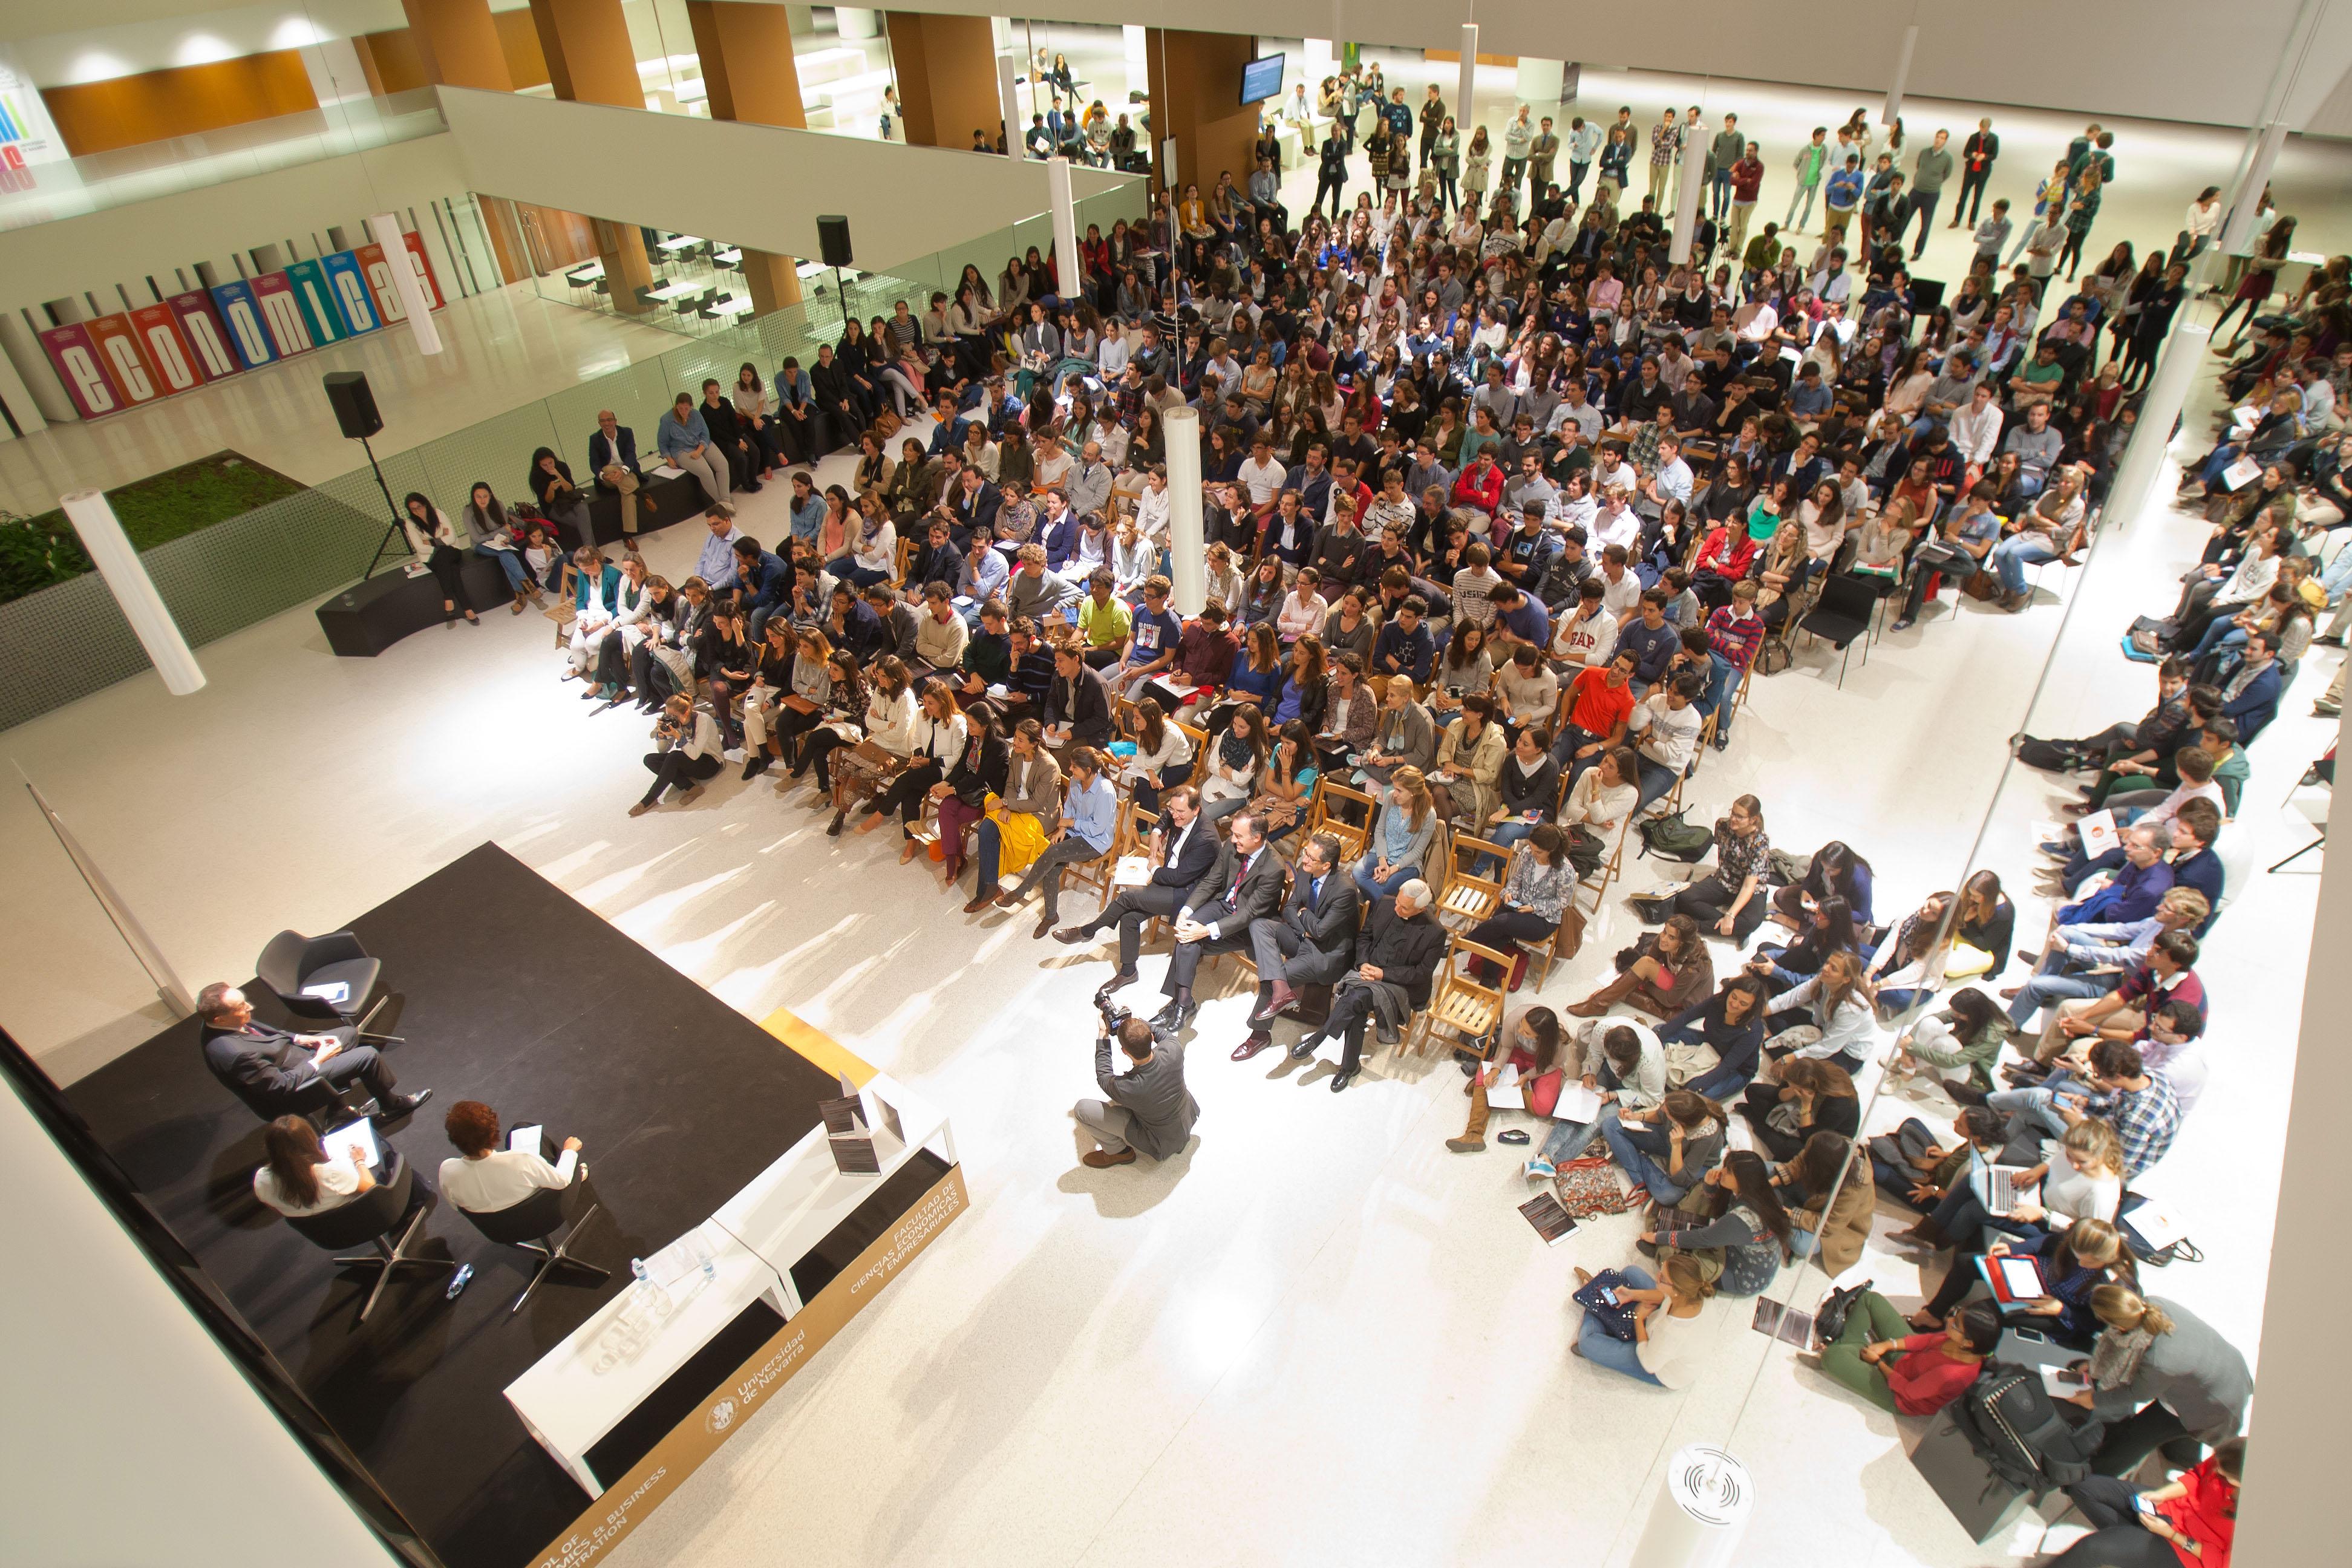 Apertura de Forum 2015 de la Universidad de Navarra